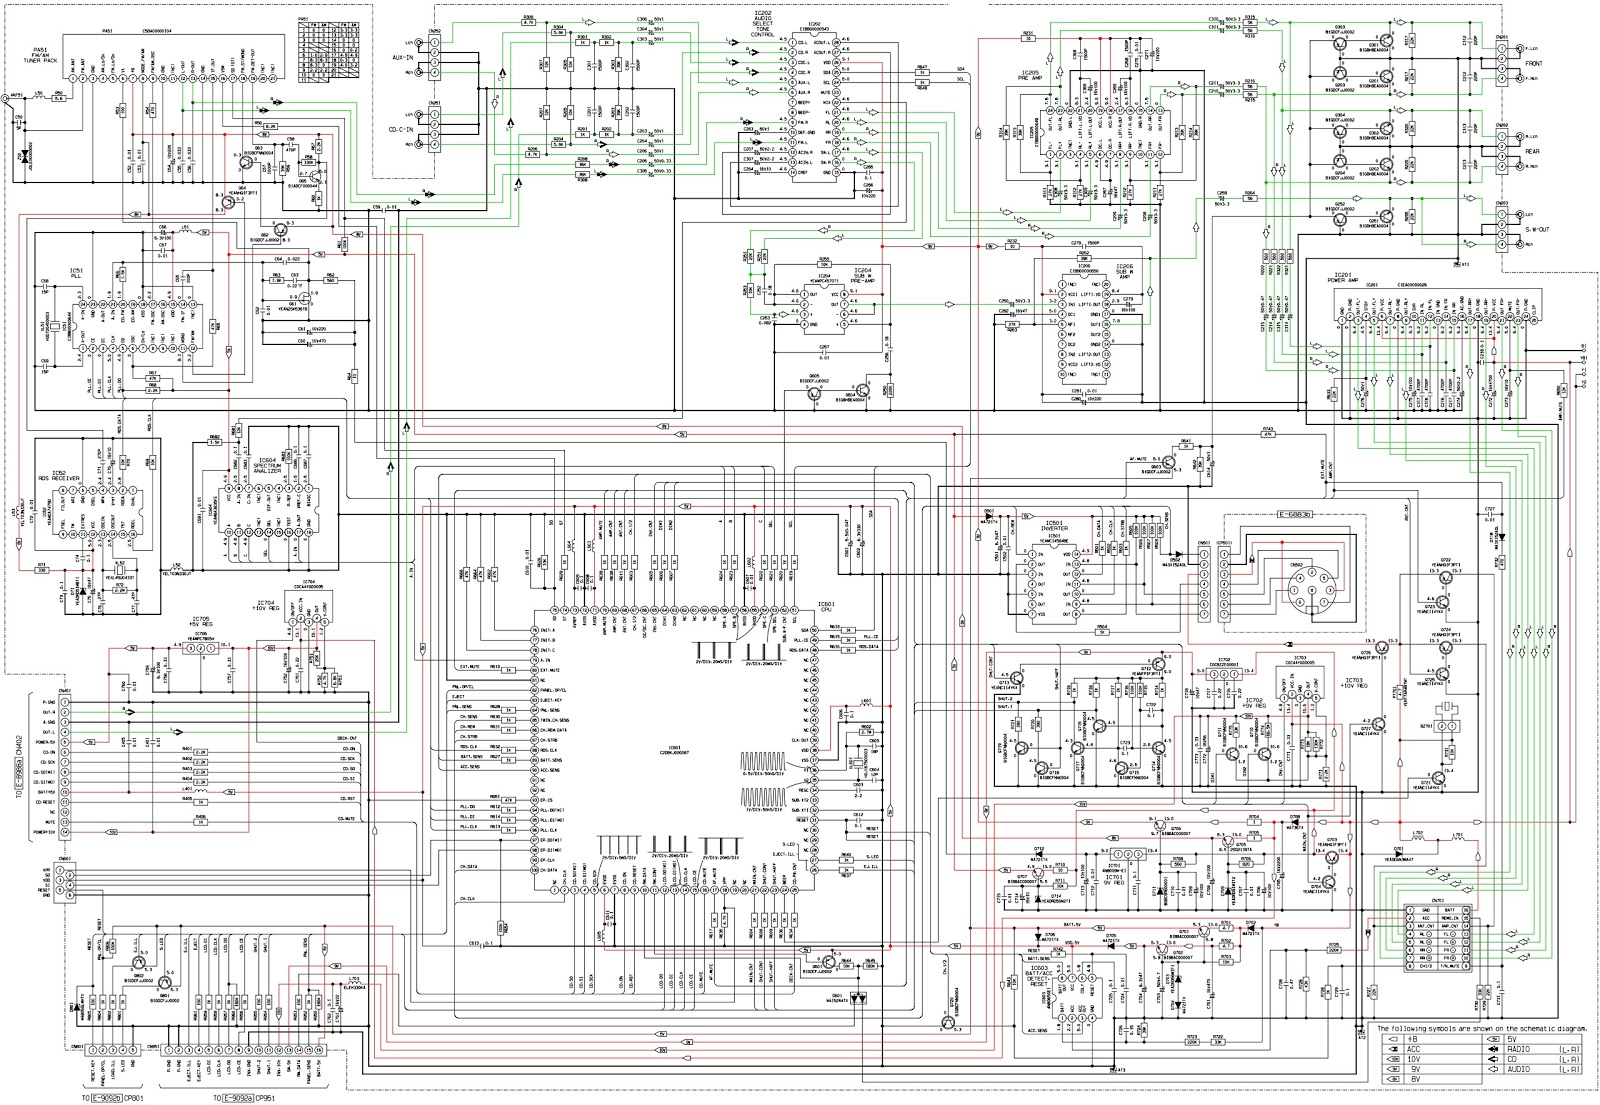 medium resolution of panasonic tv circuit diagram example electrical wiring diagram u2022 2000 chevy impala fuse box diagram 1957 corvette wiring diagram